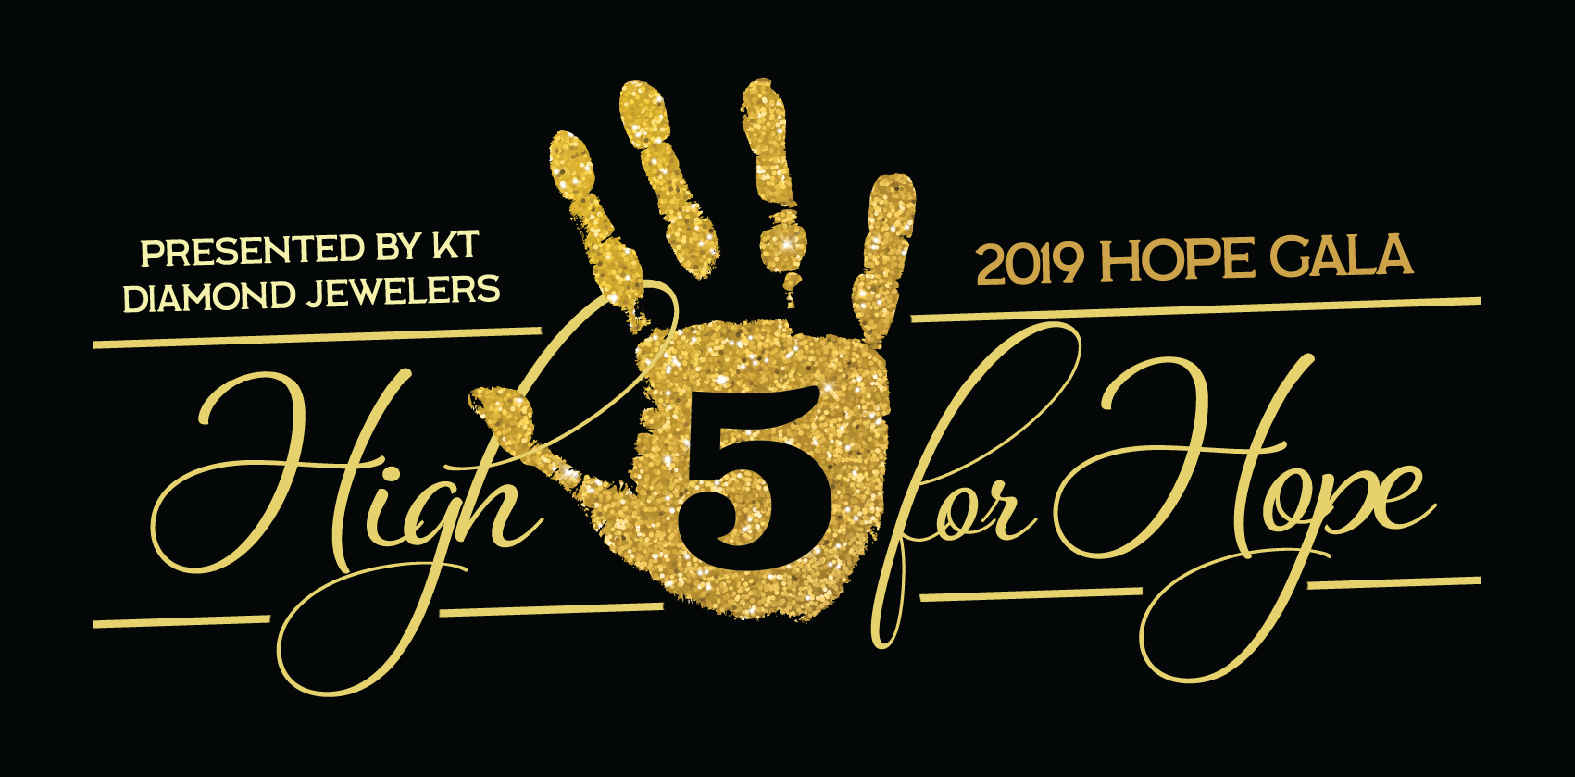 Hope Gala 2019: High 5 for Hope image